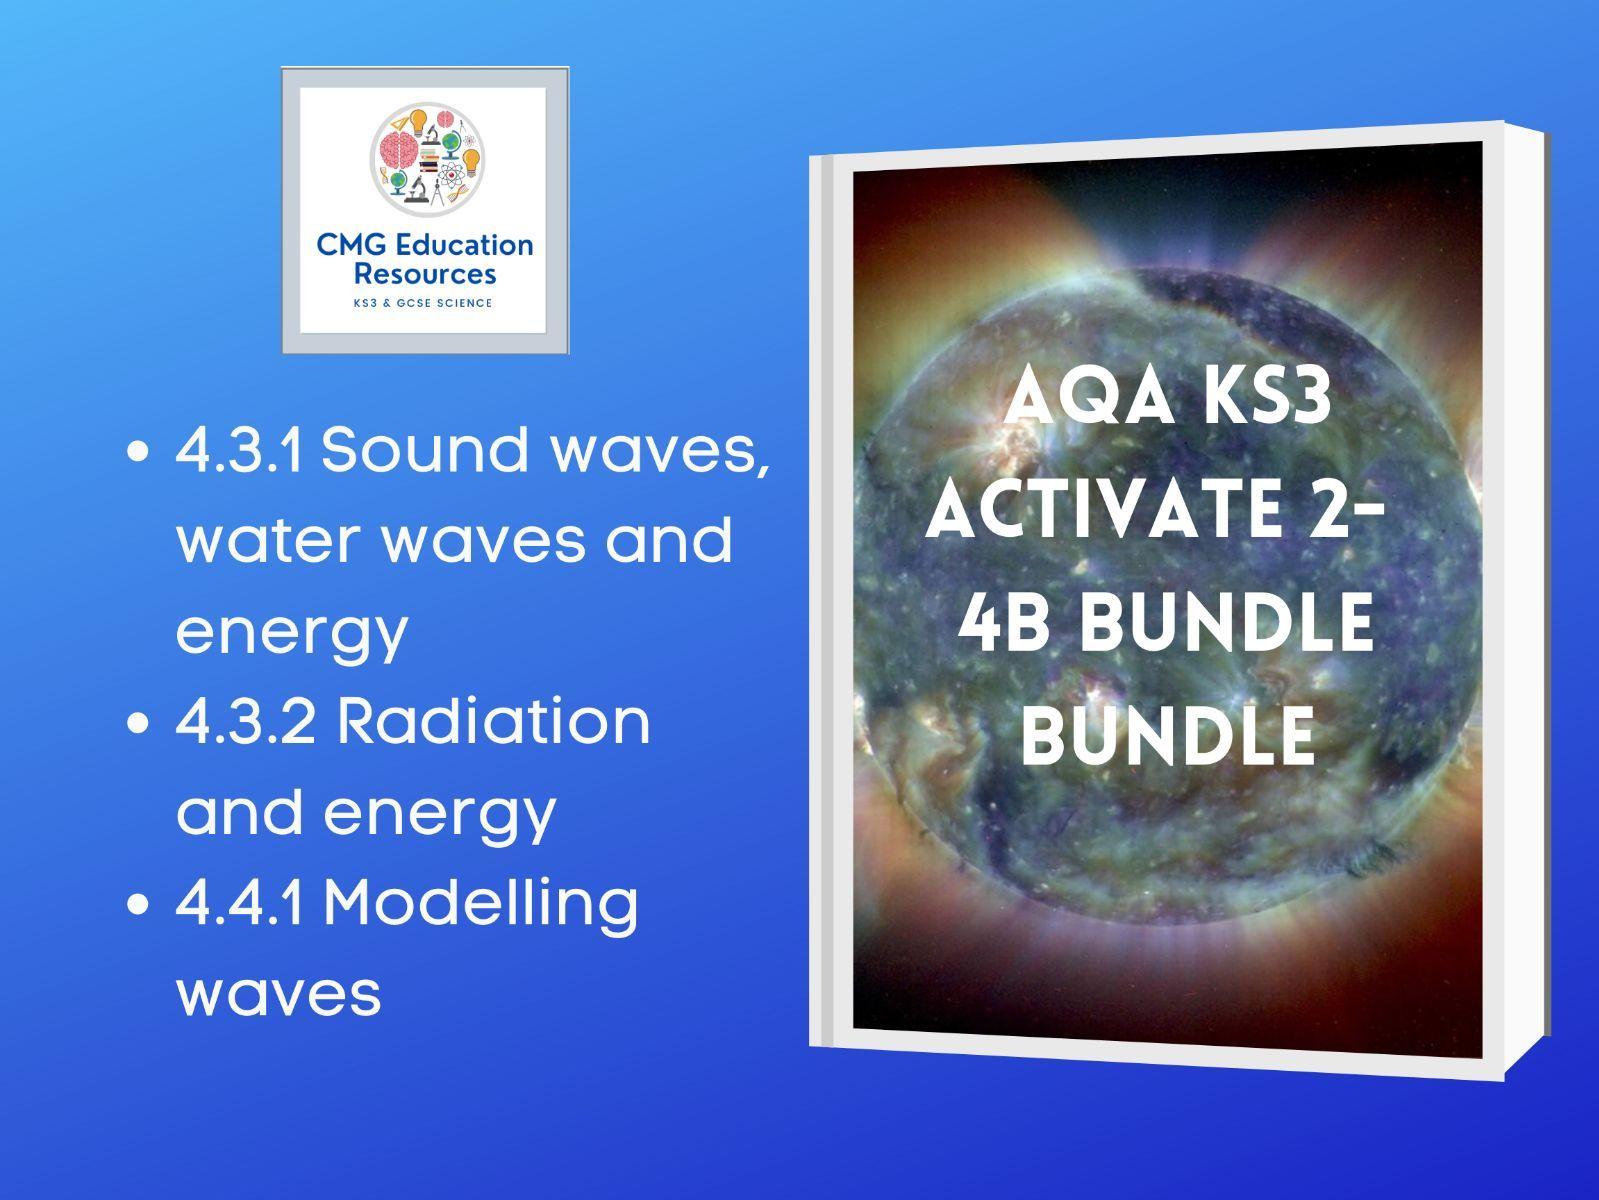 KS3 AQA Activate 2- 4b Waves bundle